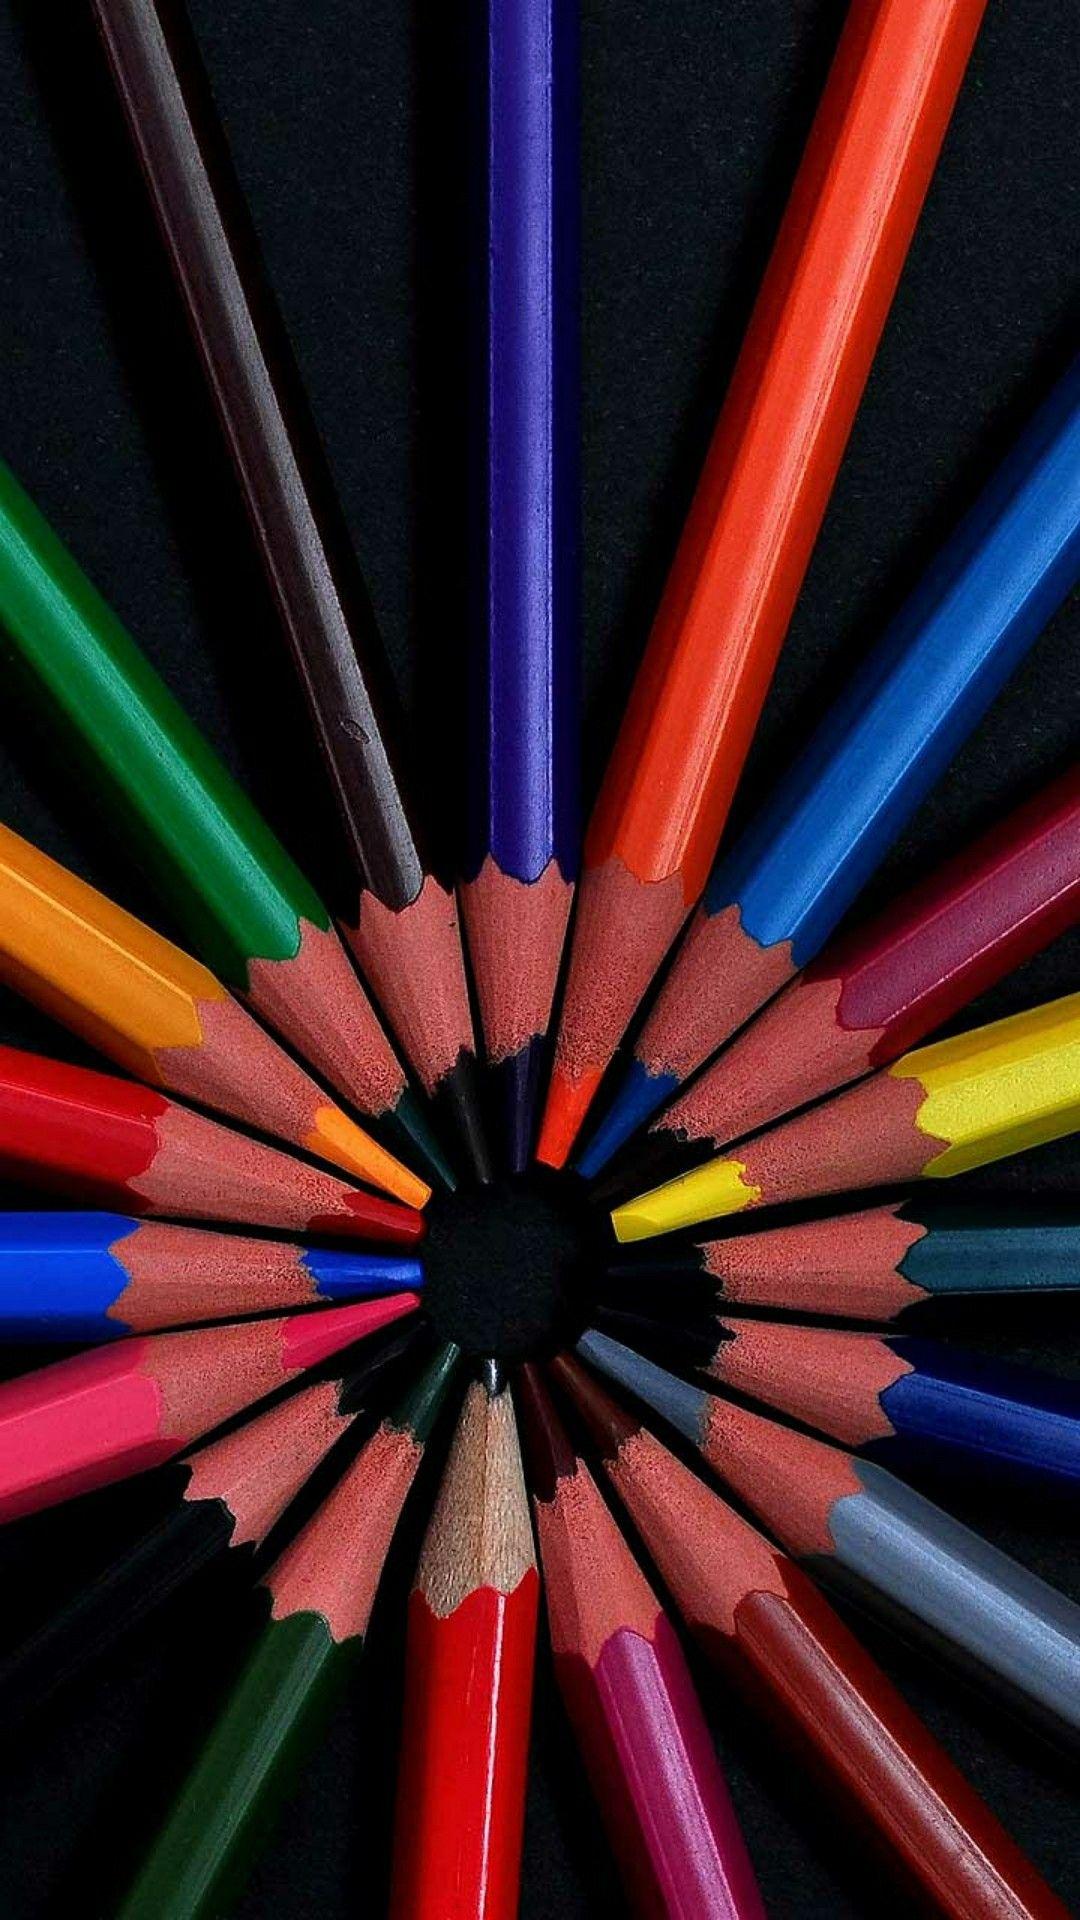 Colored pencils wallpaper Colored pencils, Iphone